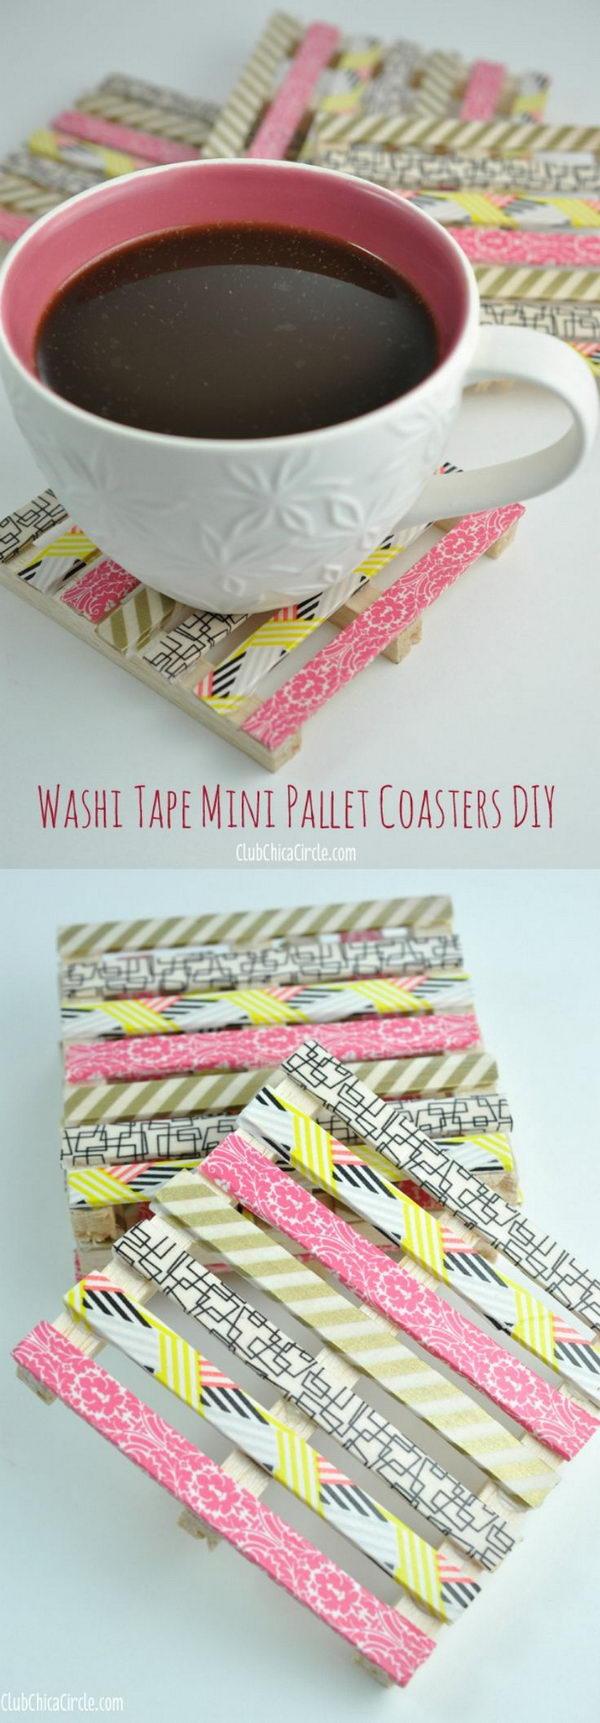 Washi Tape Mini Wood Pallet Coasters.